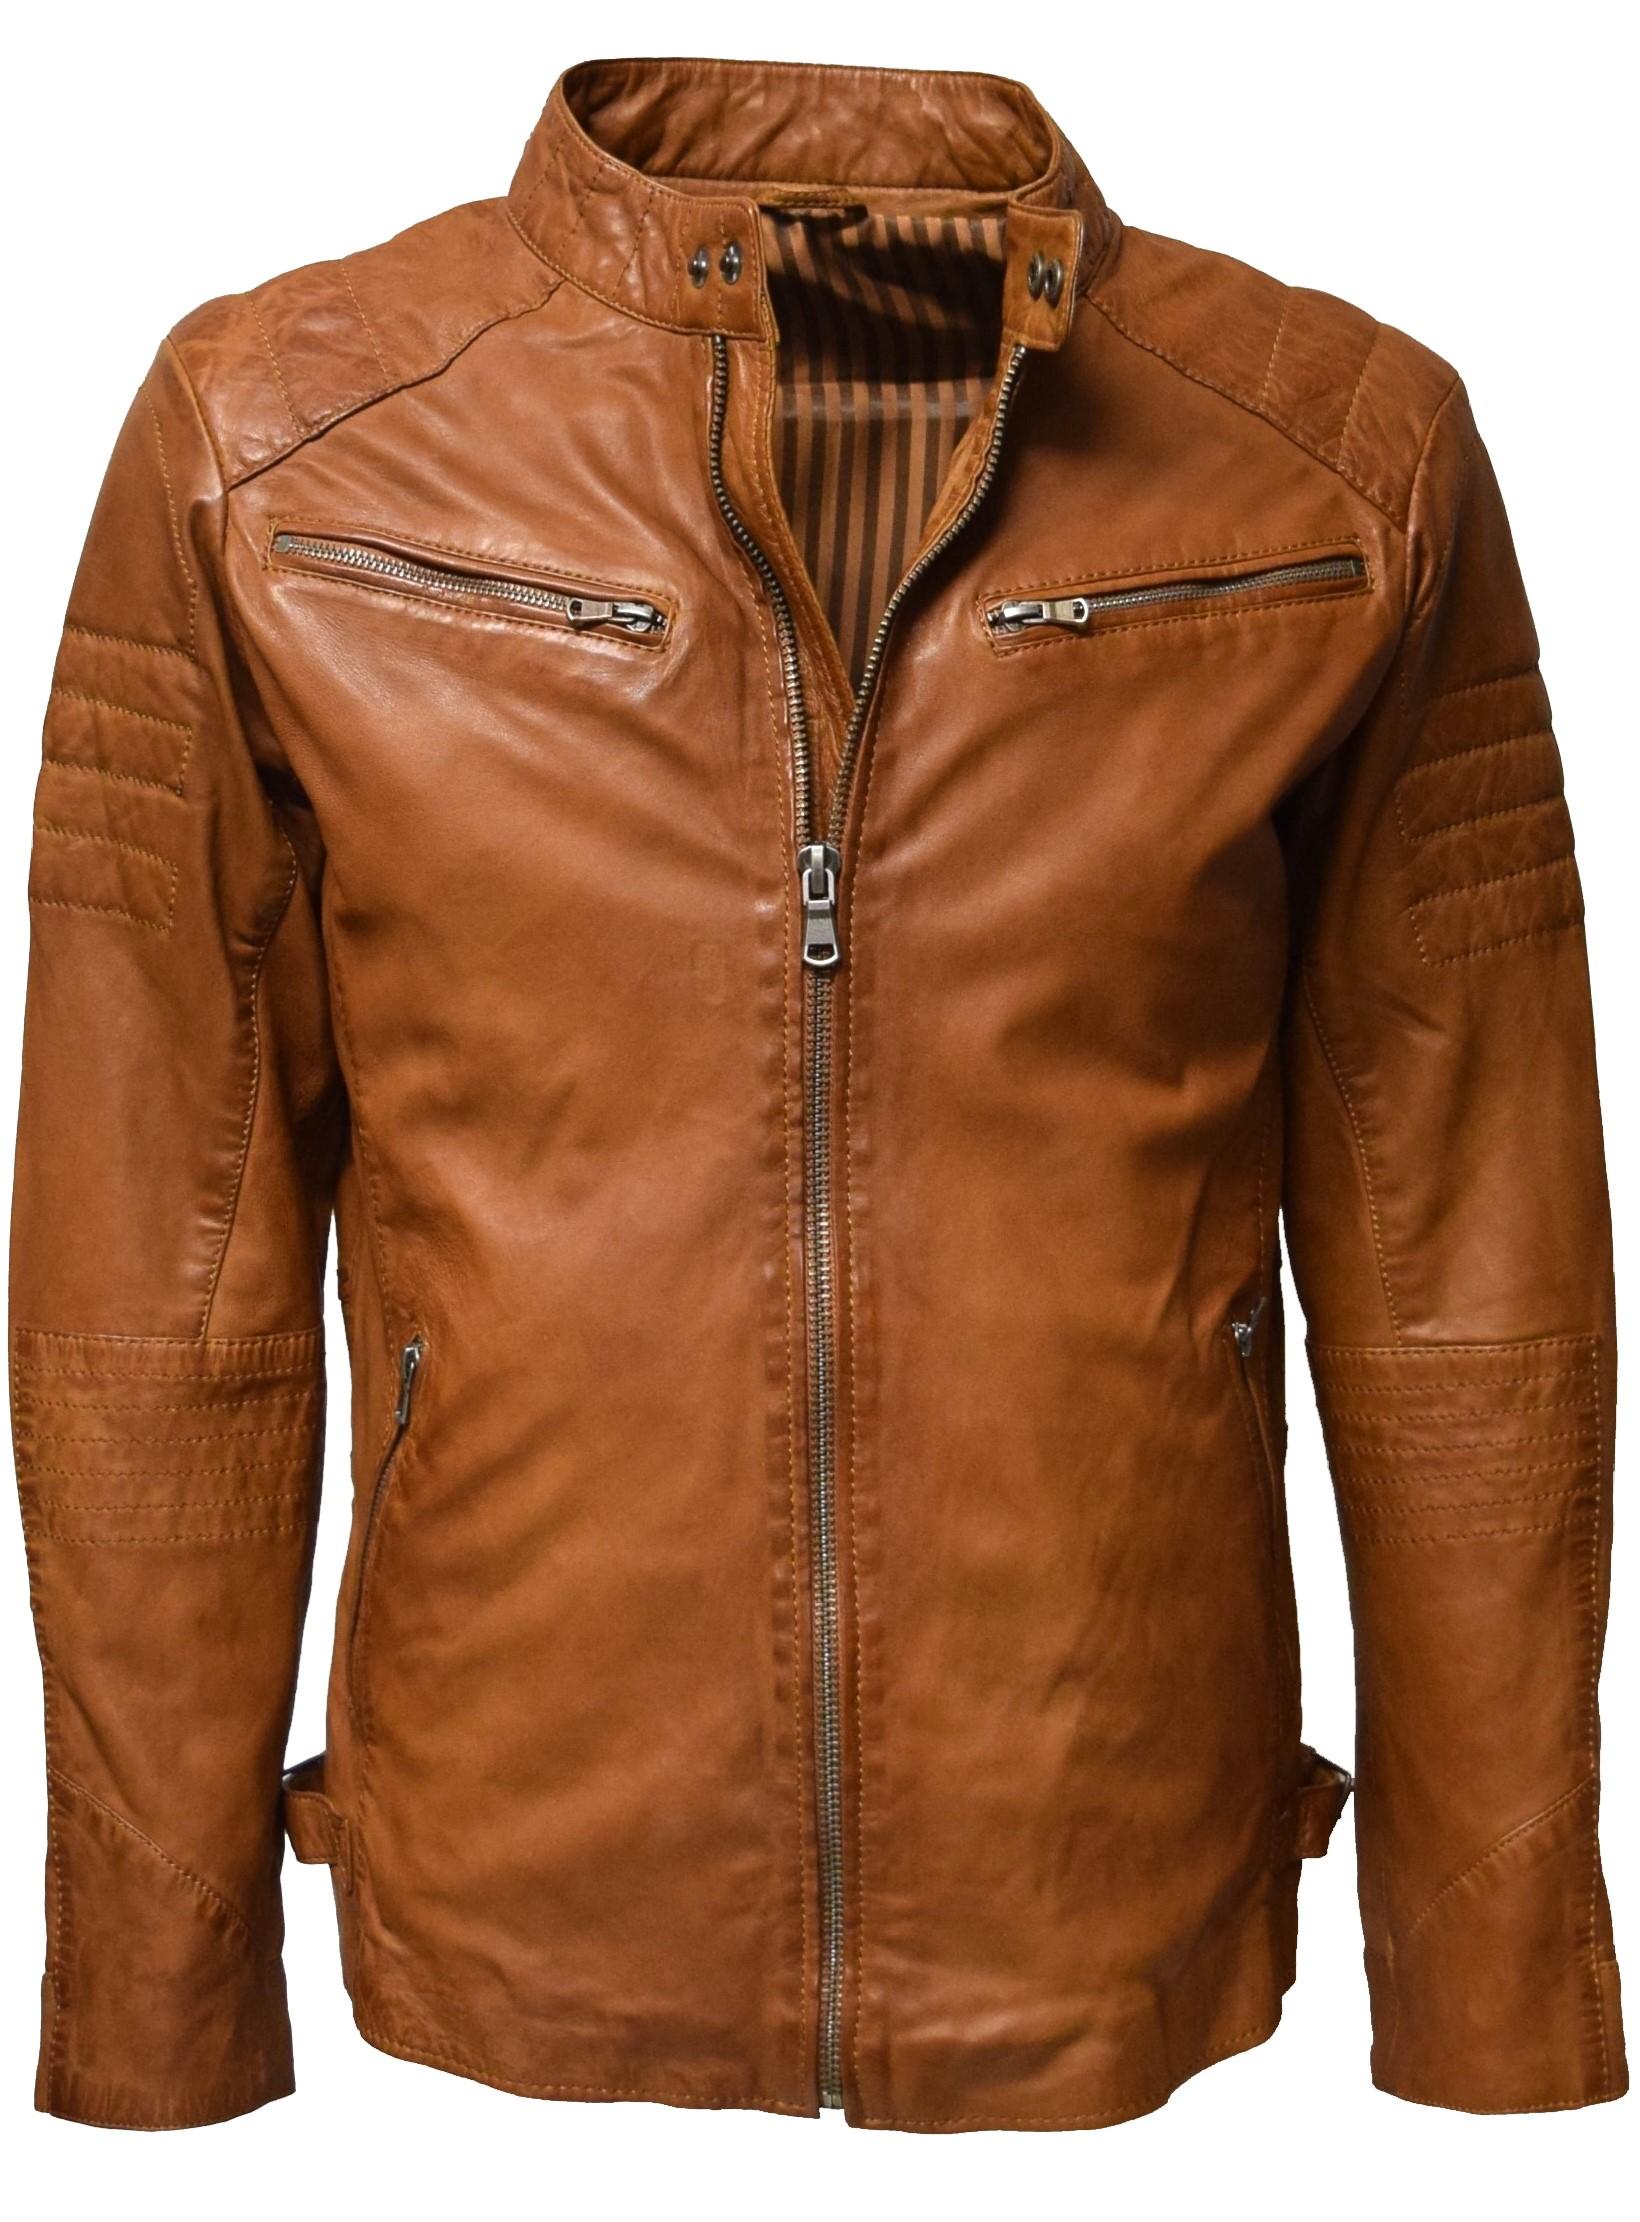 new styles 4cd37 31fa6 Herren Lederjacke Stan washed Cognac Braun